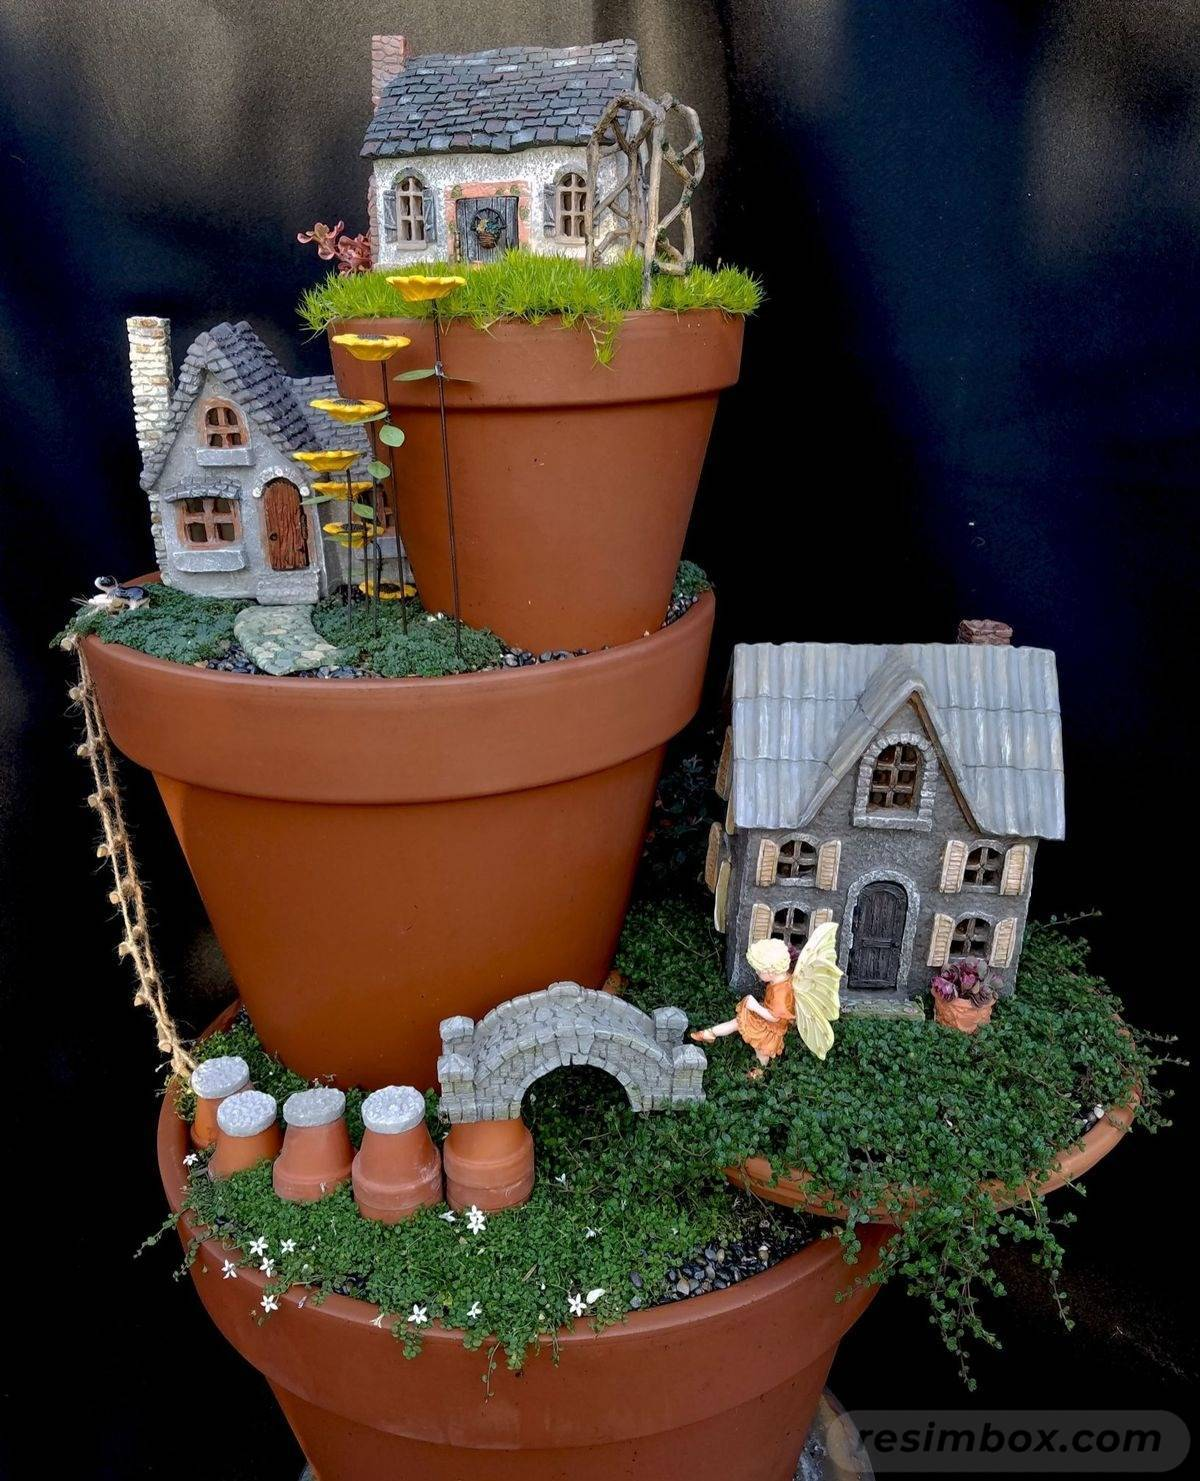 garden pot design-ATtv-5RXwRCa4ClGkx8vTIEIKrXq8WU5xv4R6lxW4ZNbAr8dx50o6Qw